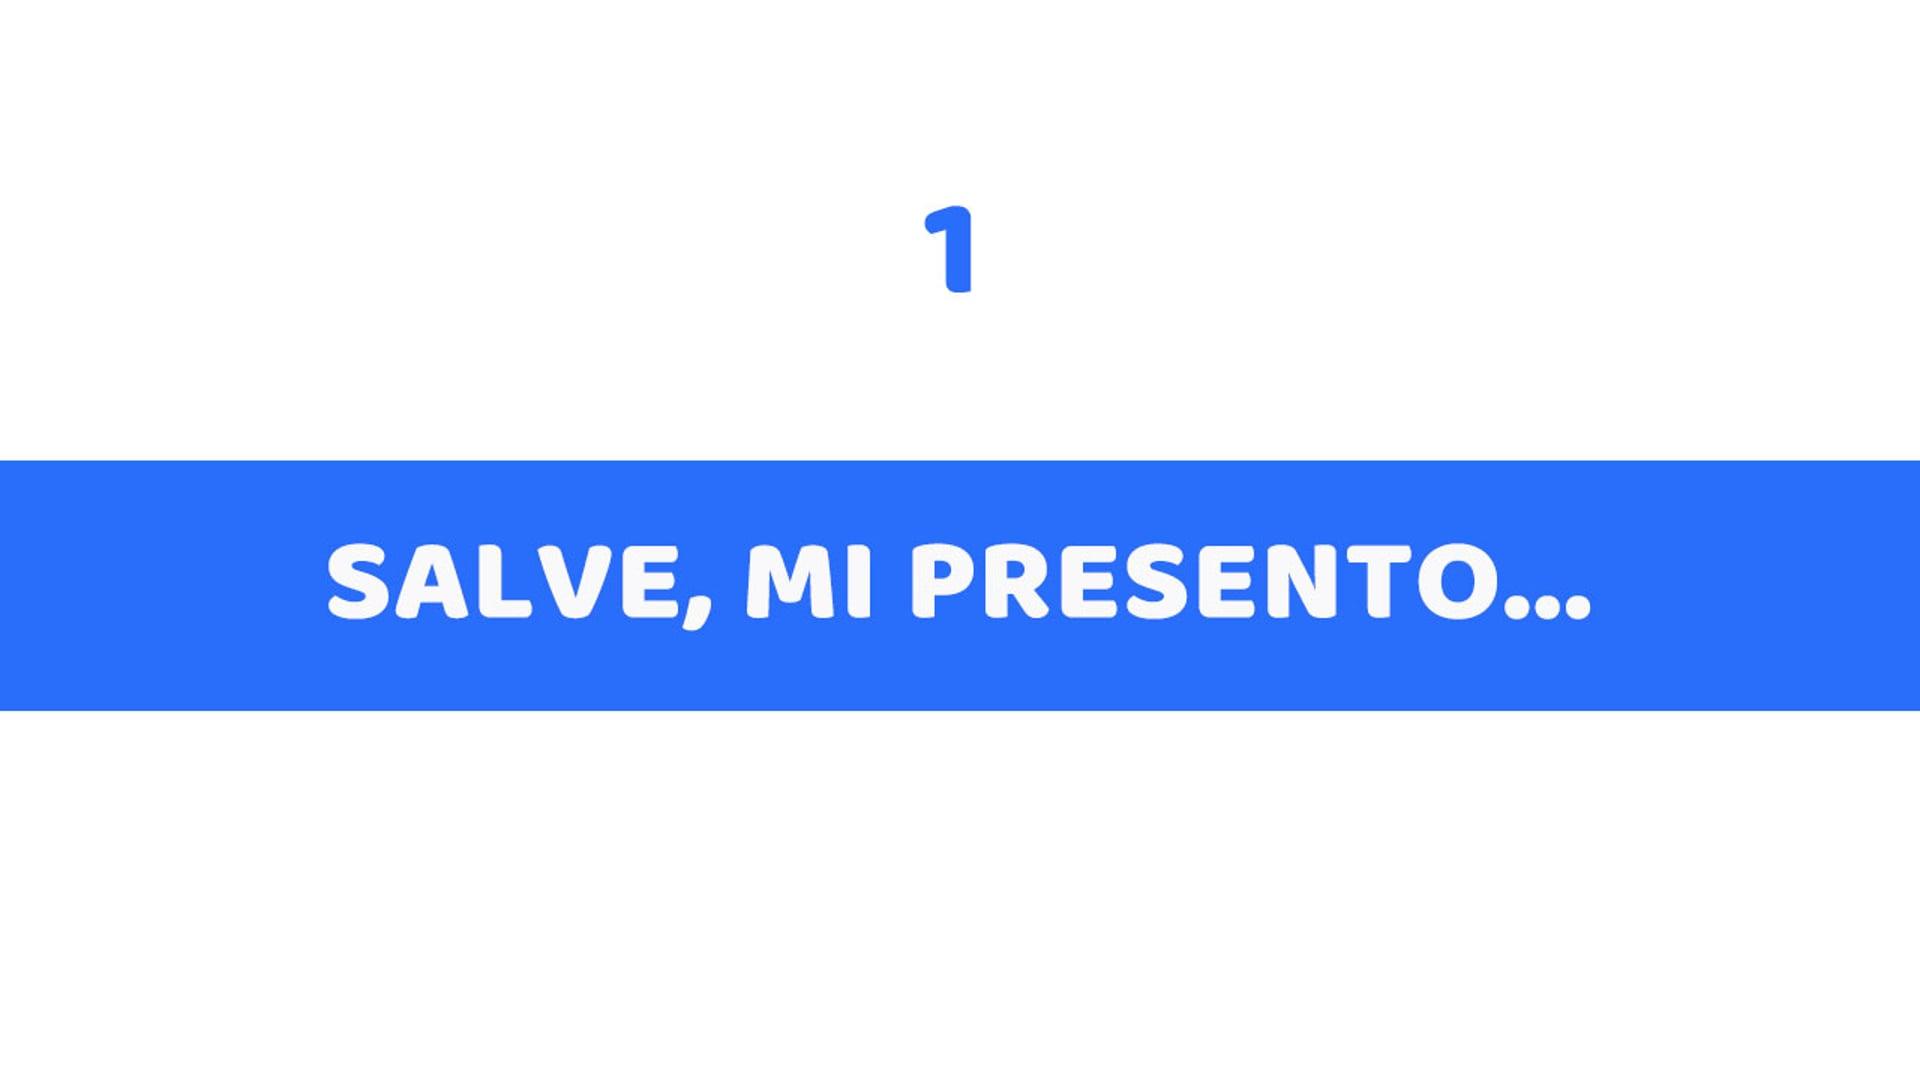 1 - SALVE MI PRESENTO